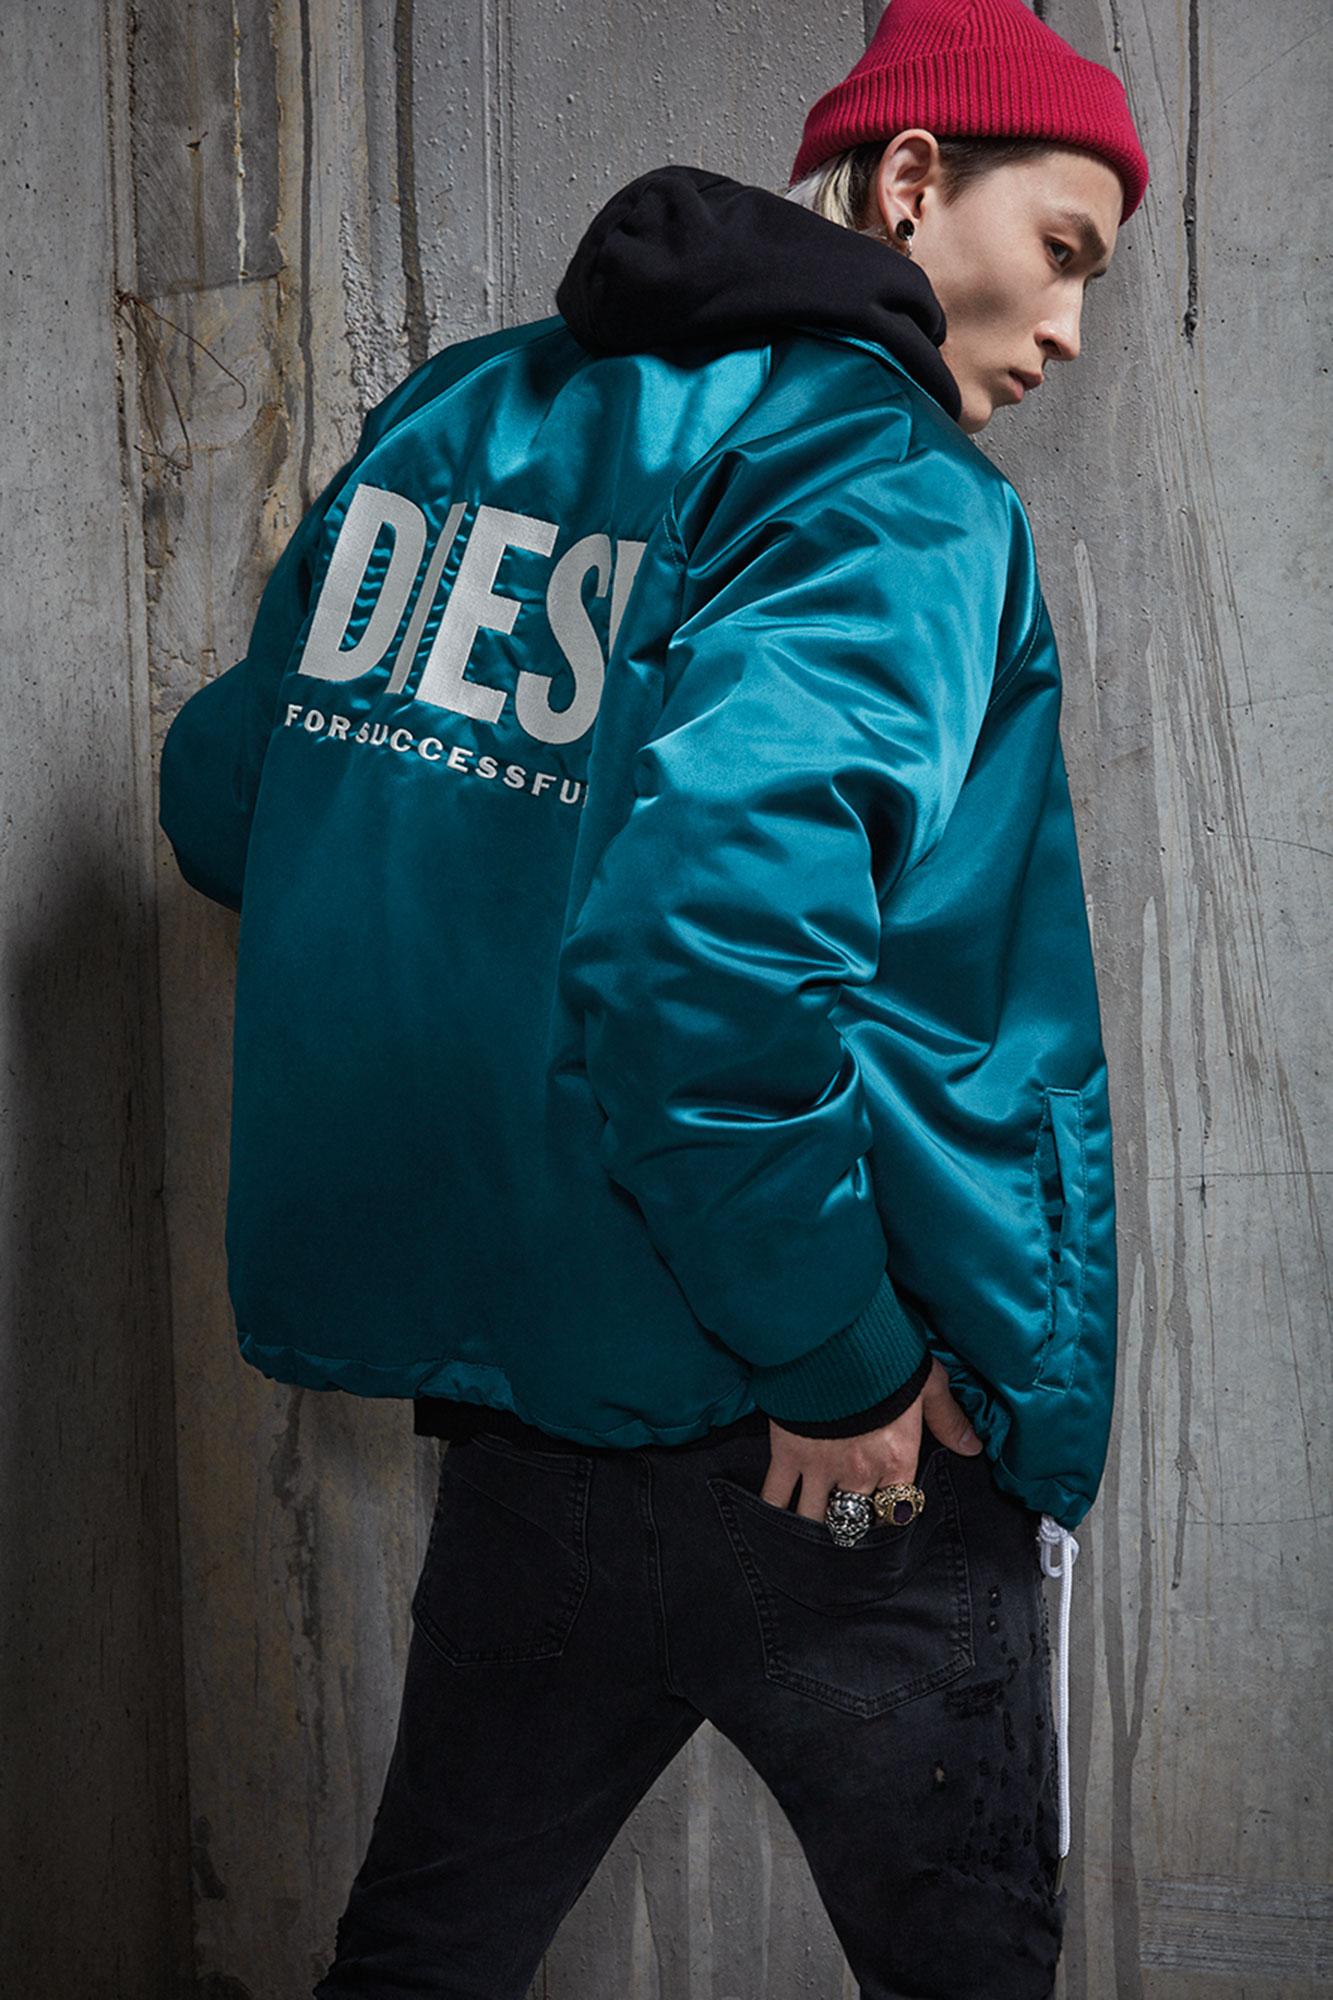 Diesel Digital Book 2019 | Diesel | Numerique Retouch Photo Retouching Studio